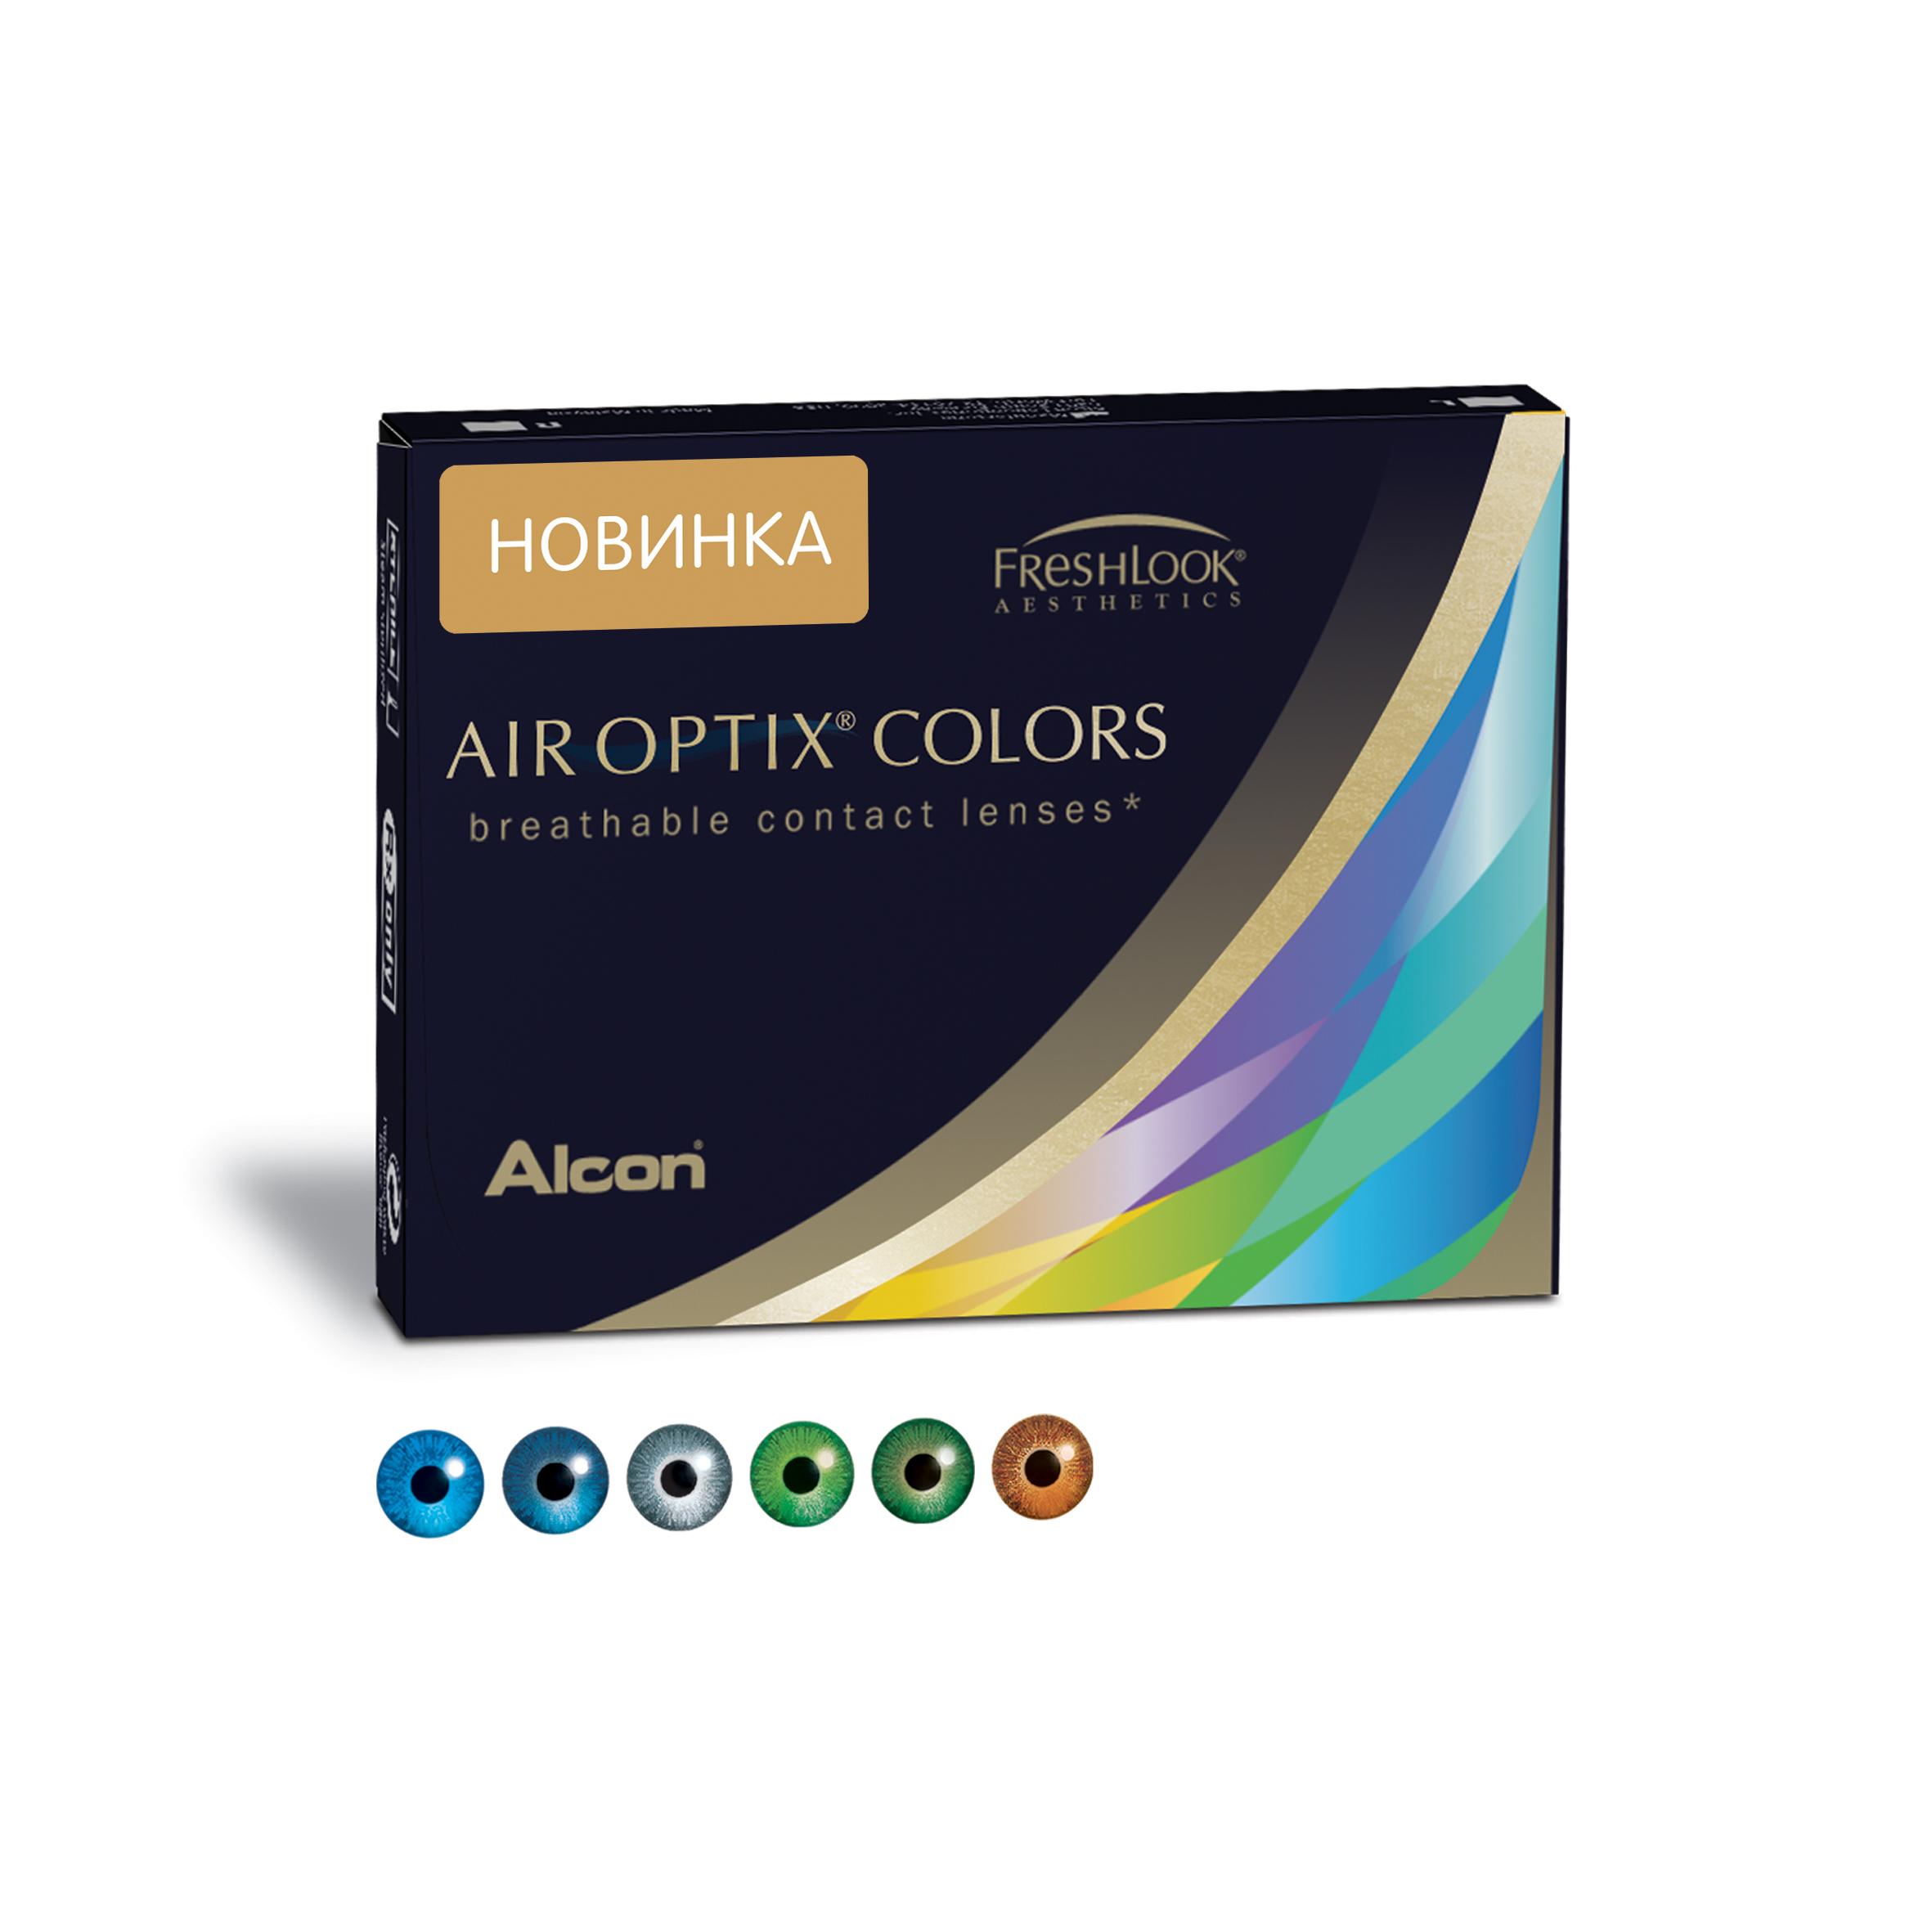 Аlcon контактные линзы Air Optix Colors 2 шт -3.75 Honey31746226Мягкие контактные линзы